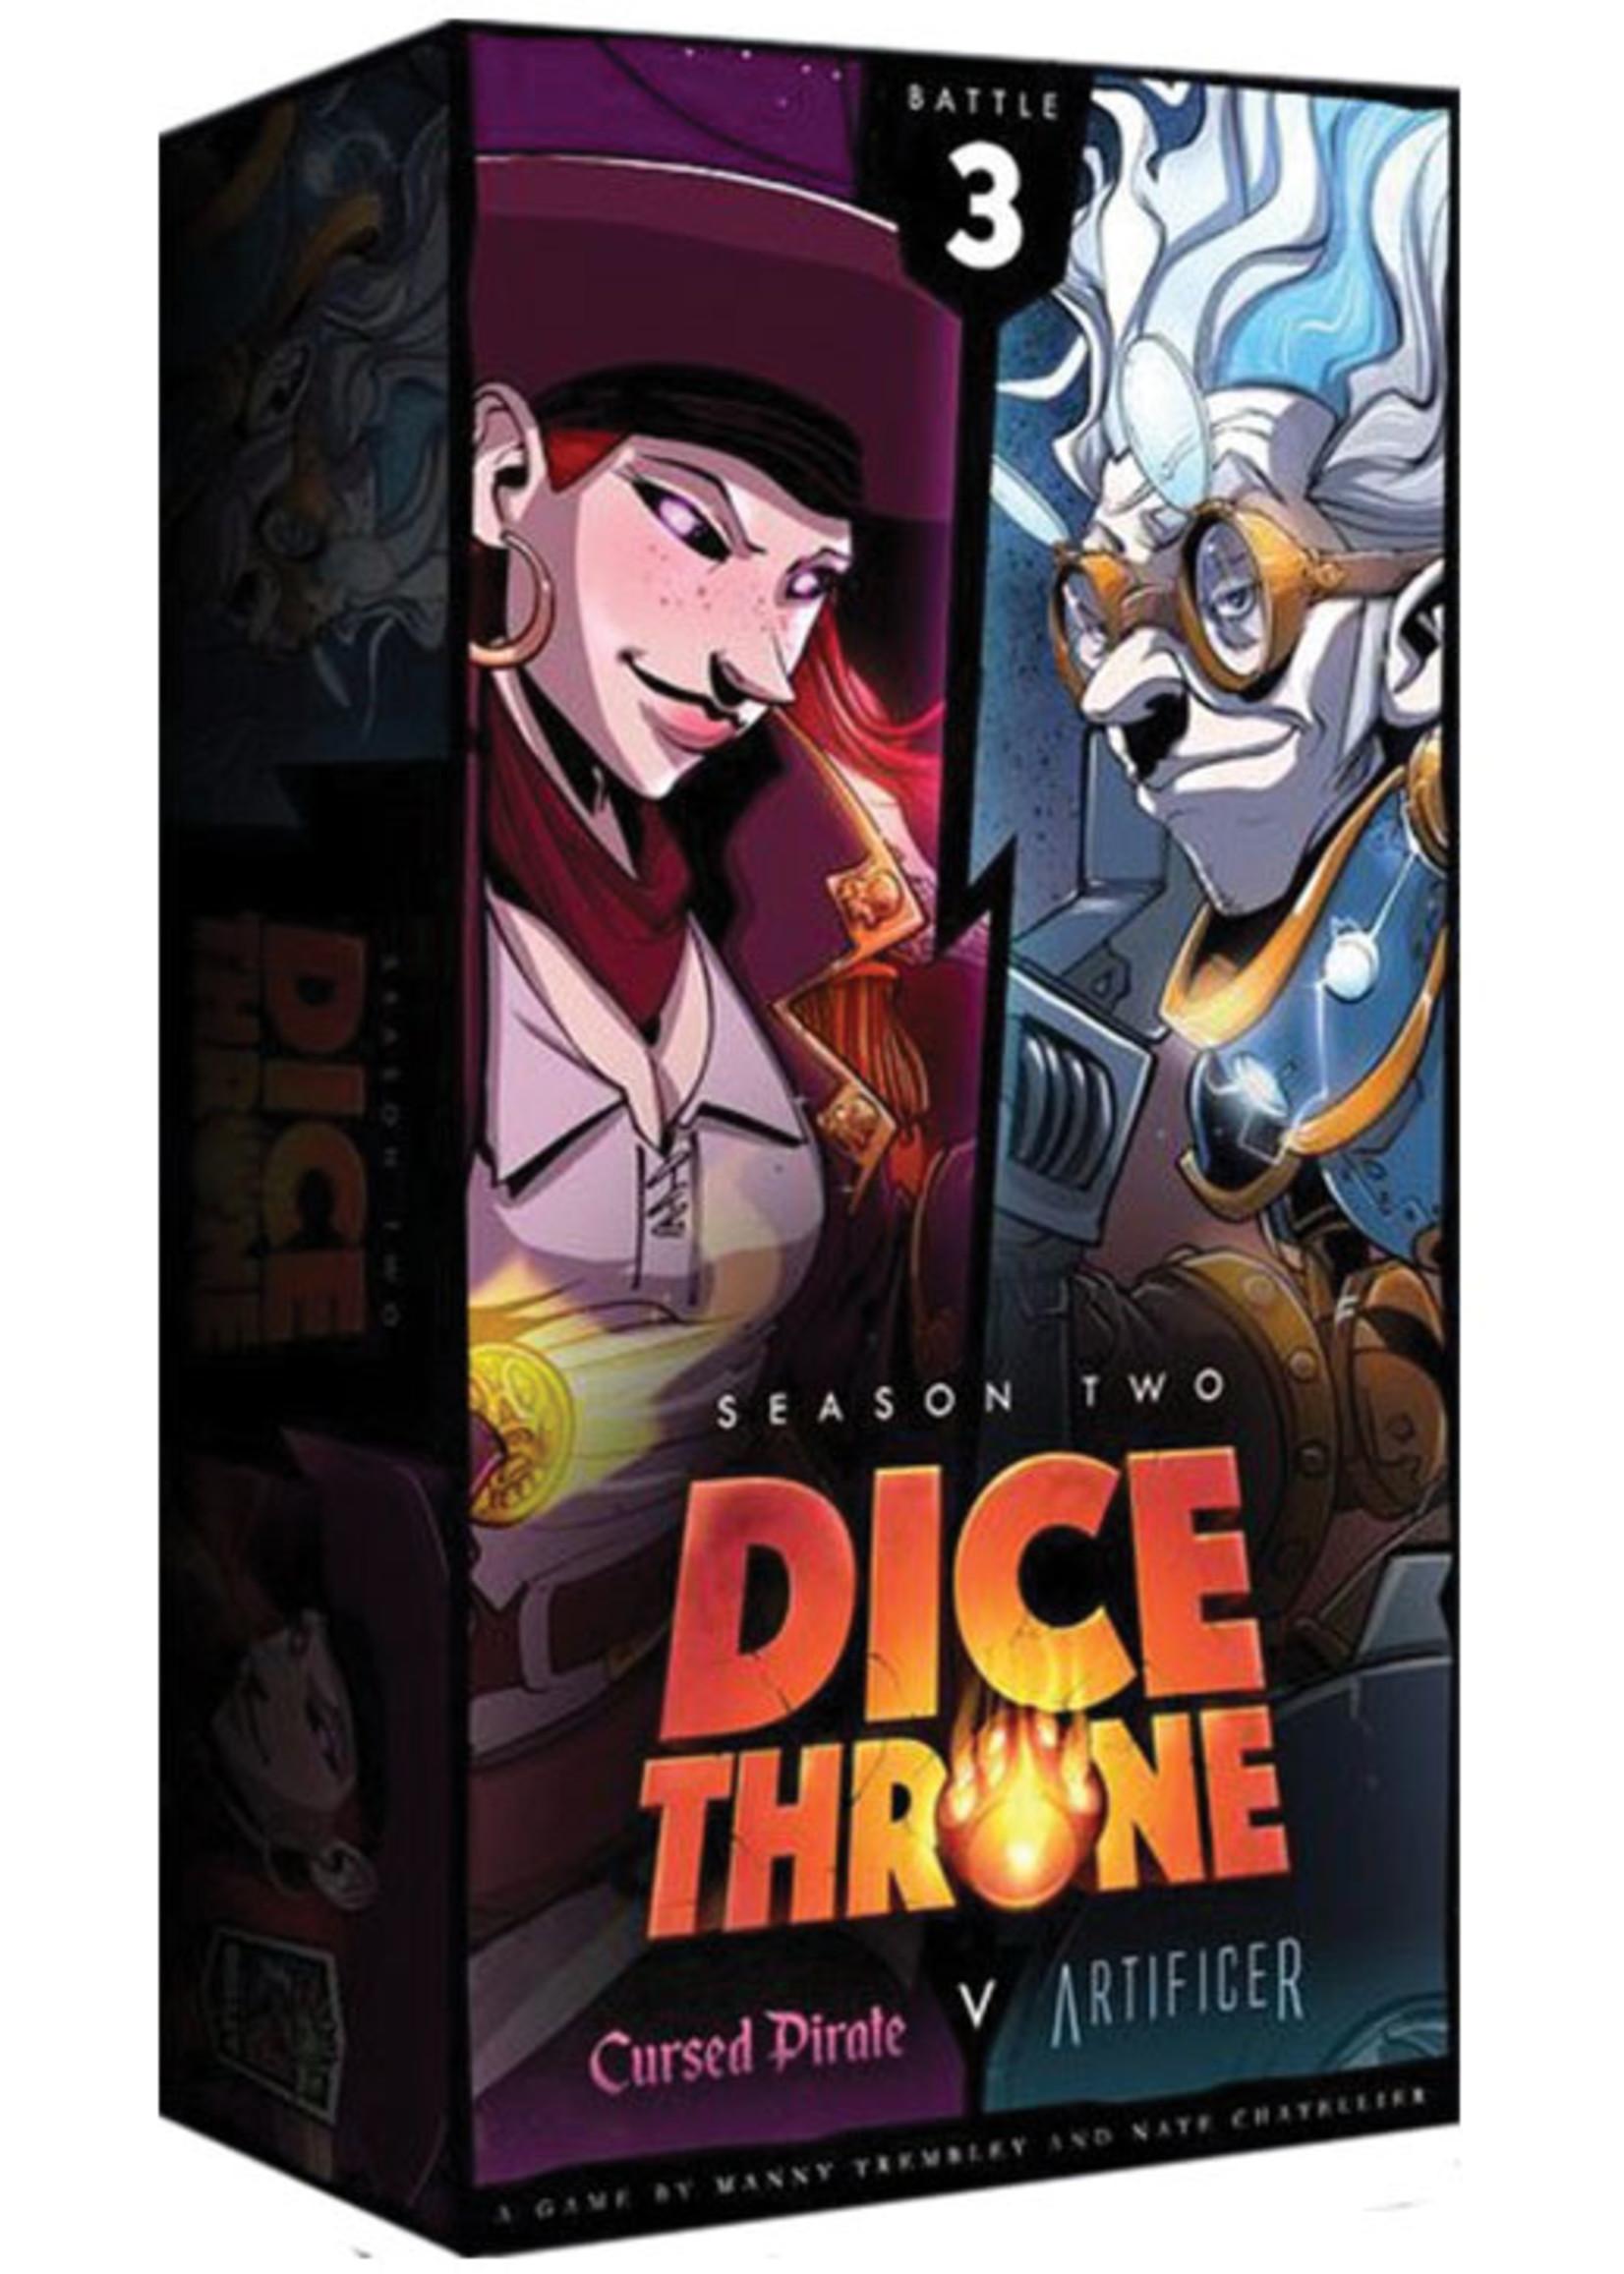 Roxley Dice Throne - Season 2: Box 3 Cursed Pirate vs. Artificer